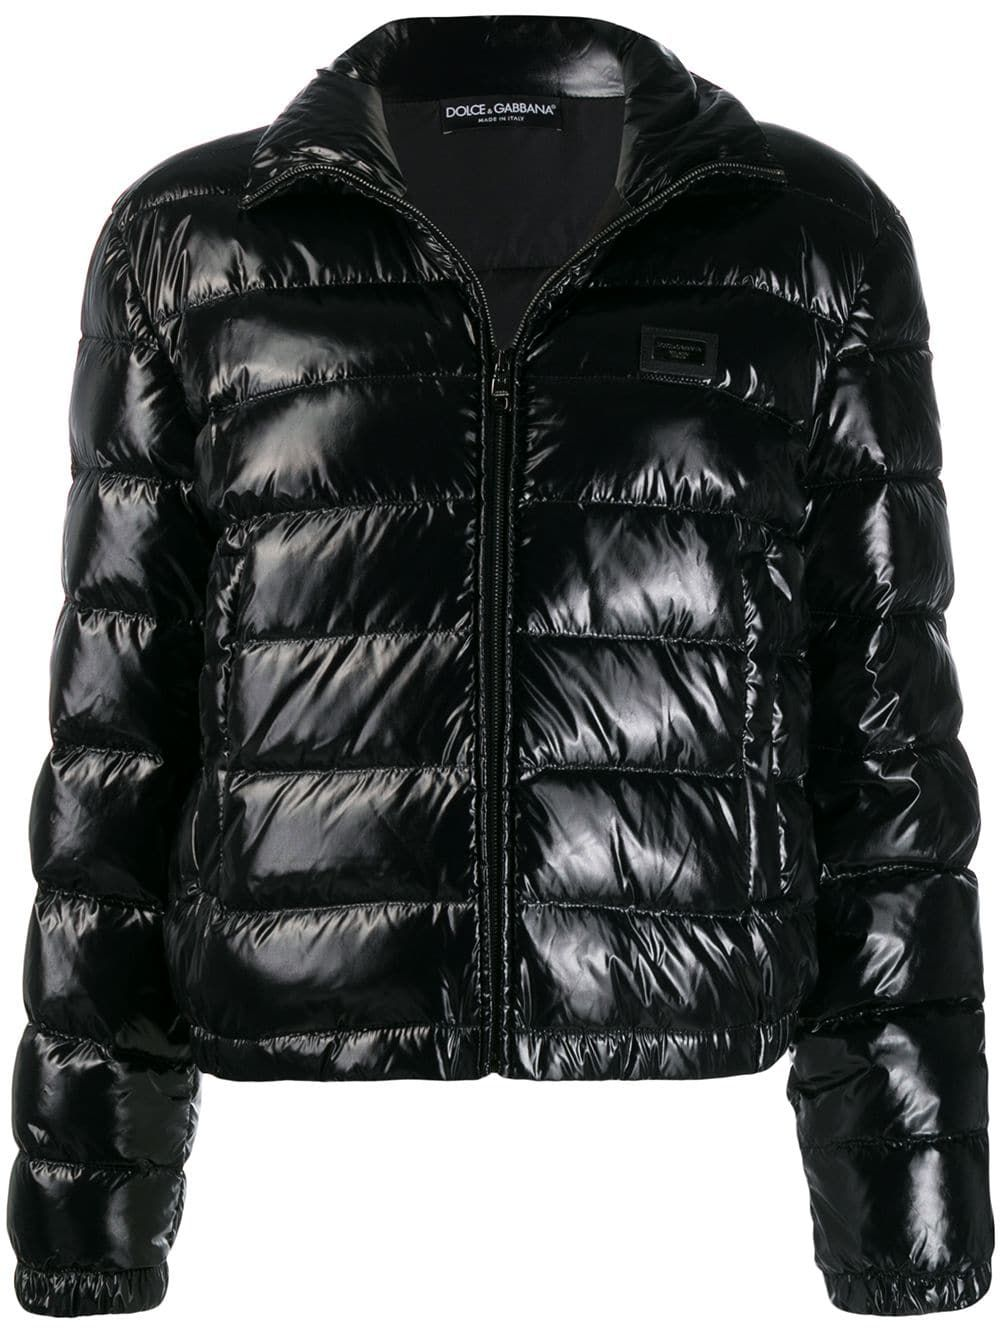 Dolce Gabbana Shiny Puffer Jacket Farfetch Dolce And Gabbana Puffer Jackets Puffer Jacket Women [ 1334 x 1000 Pixel ]